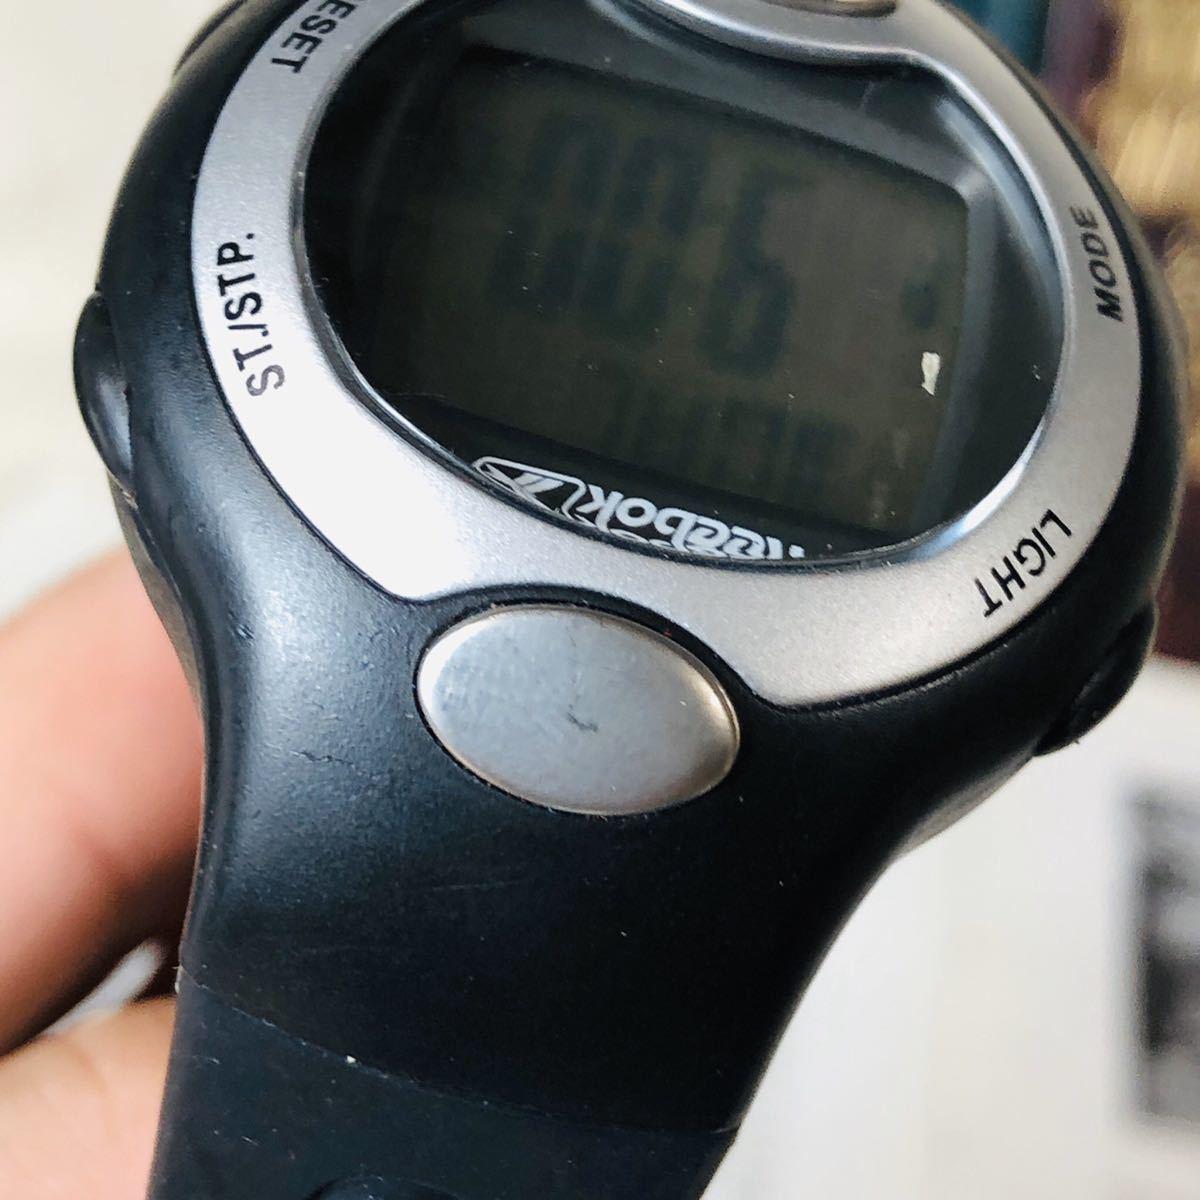 Reebok リーボック 腕時計 マットサテンシルバーカラー ブラック 心拍計 クロノ タイマー デジタル 稼動品 W730_画像10